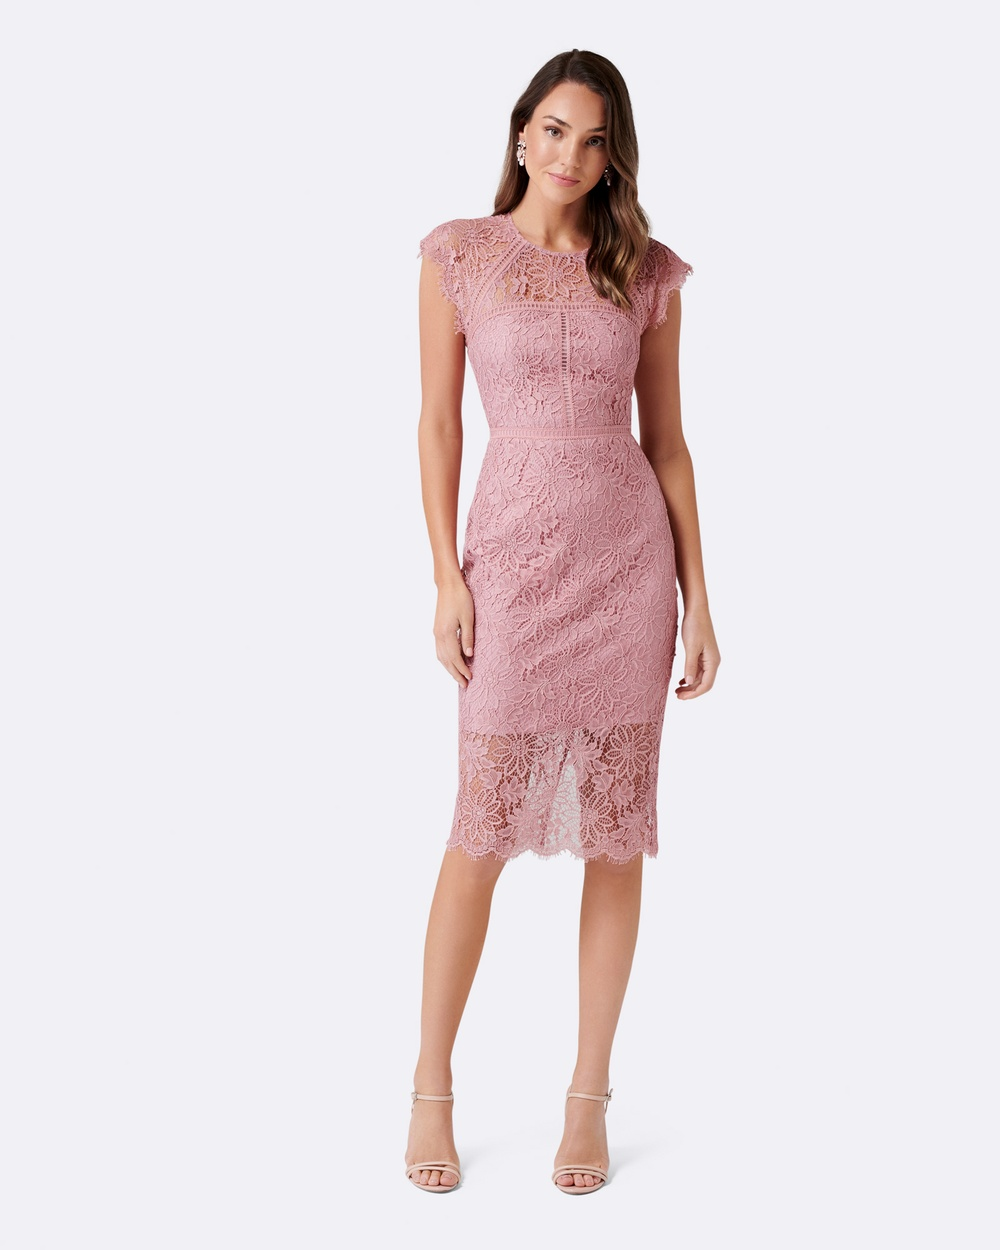 Forever New Petite Petite Tara Lace Pencil Dress Dresses Pink Flutter Petite Tara Lace Pencil Dress